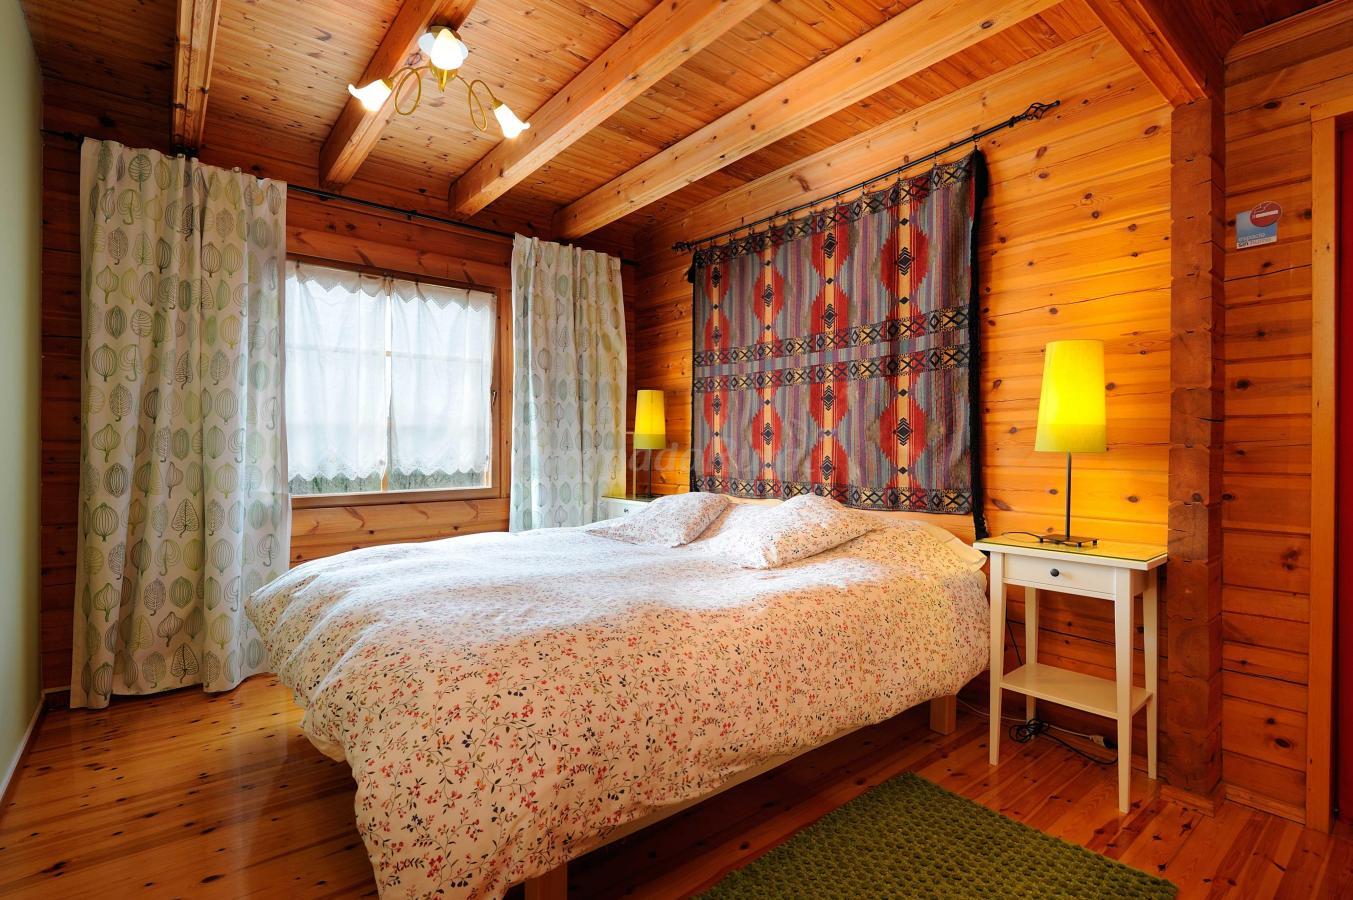 Fotos de la casa de madera casa rural en arrieta vizcaya - Casa rural de madera ...